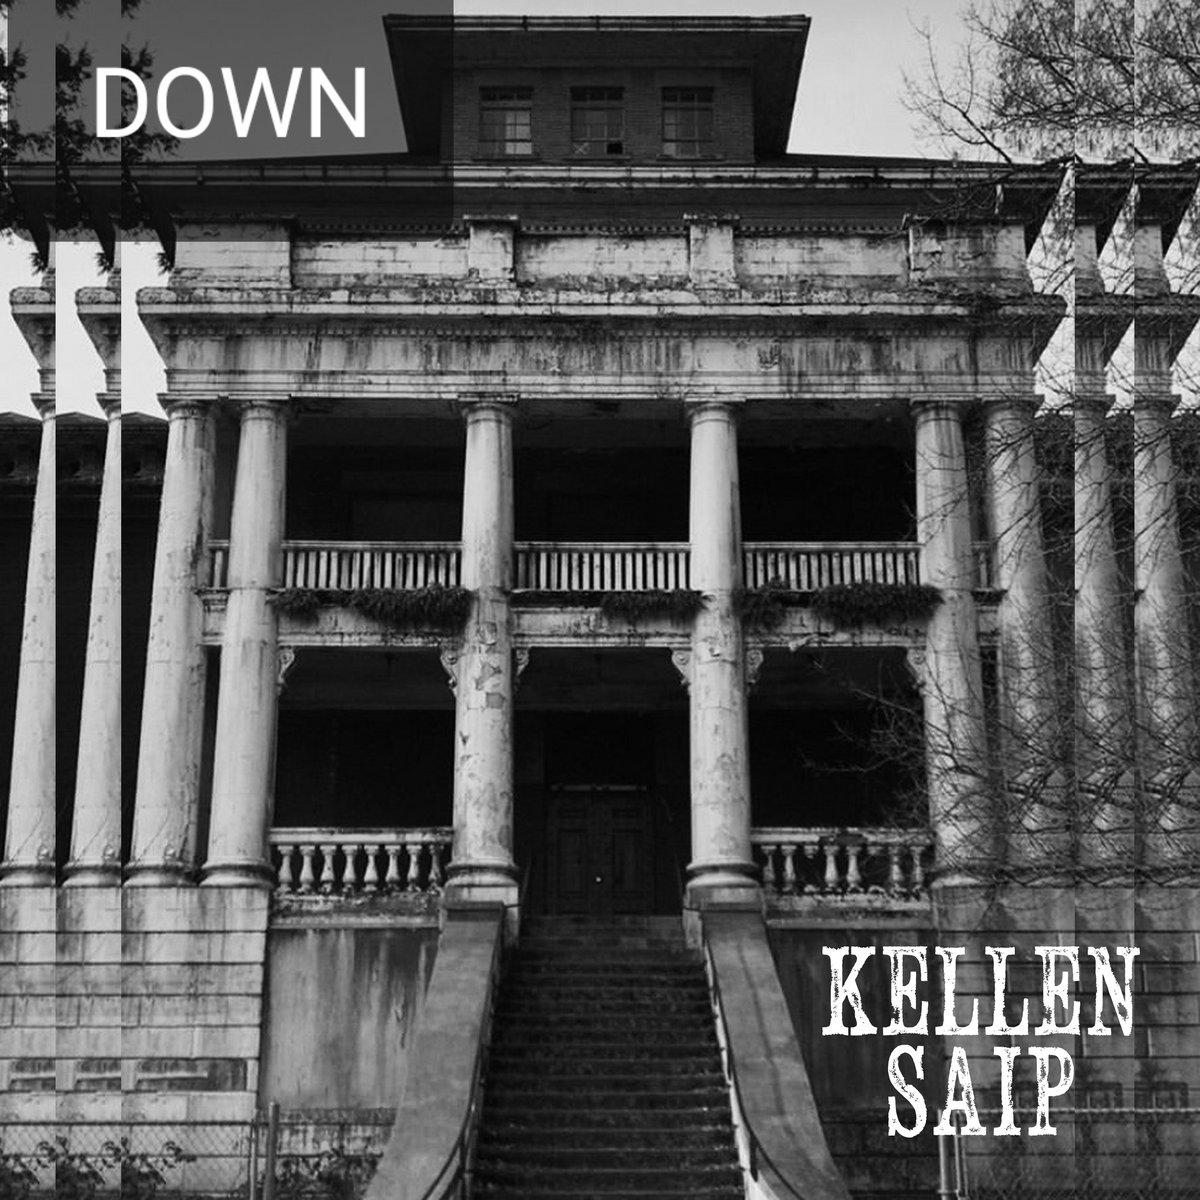 Down by Kellen Saip